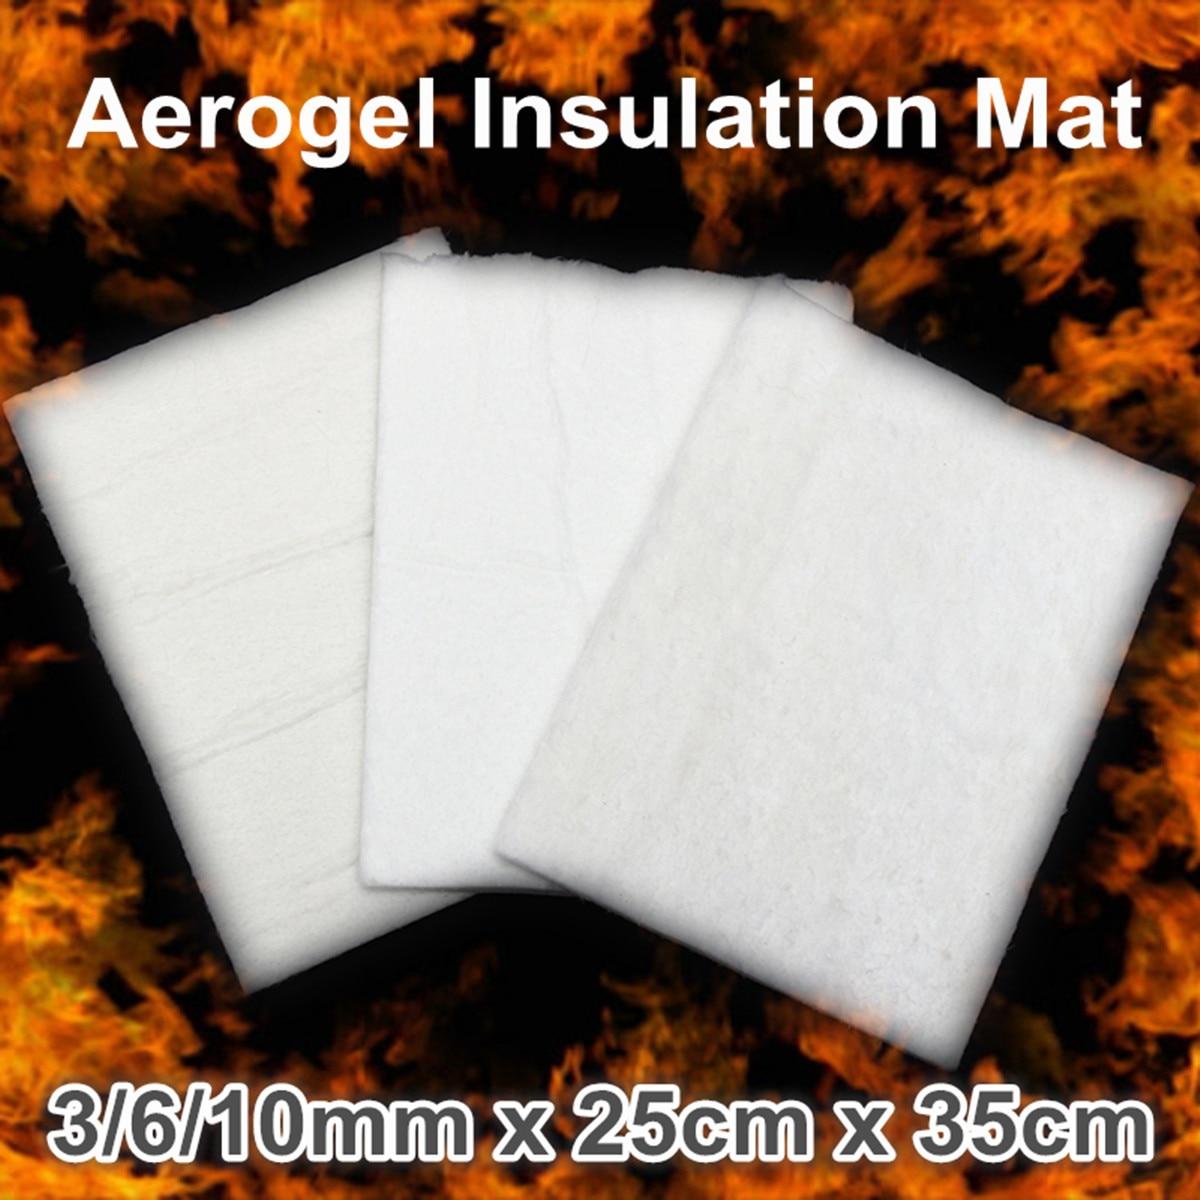 Super Light Silica Aerogel Insulation Hydrophobic Mat Lightest Solid 200x150 G3